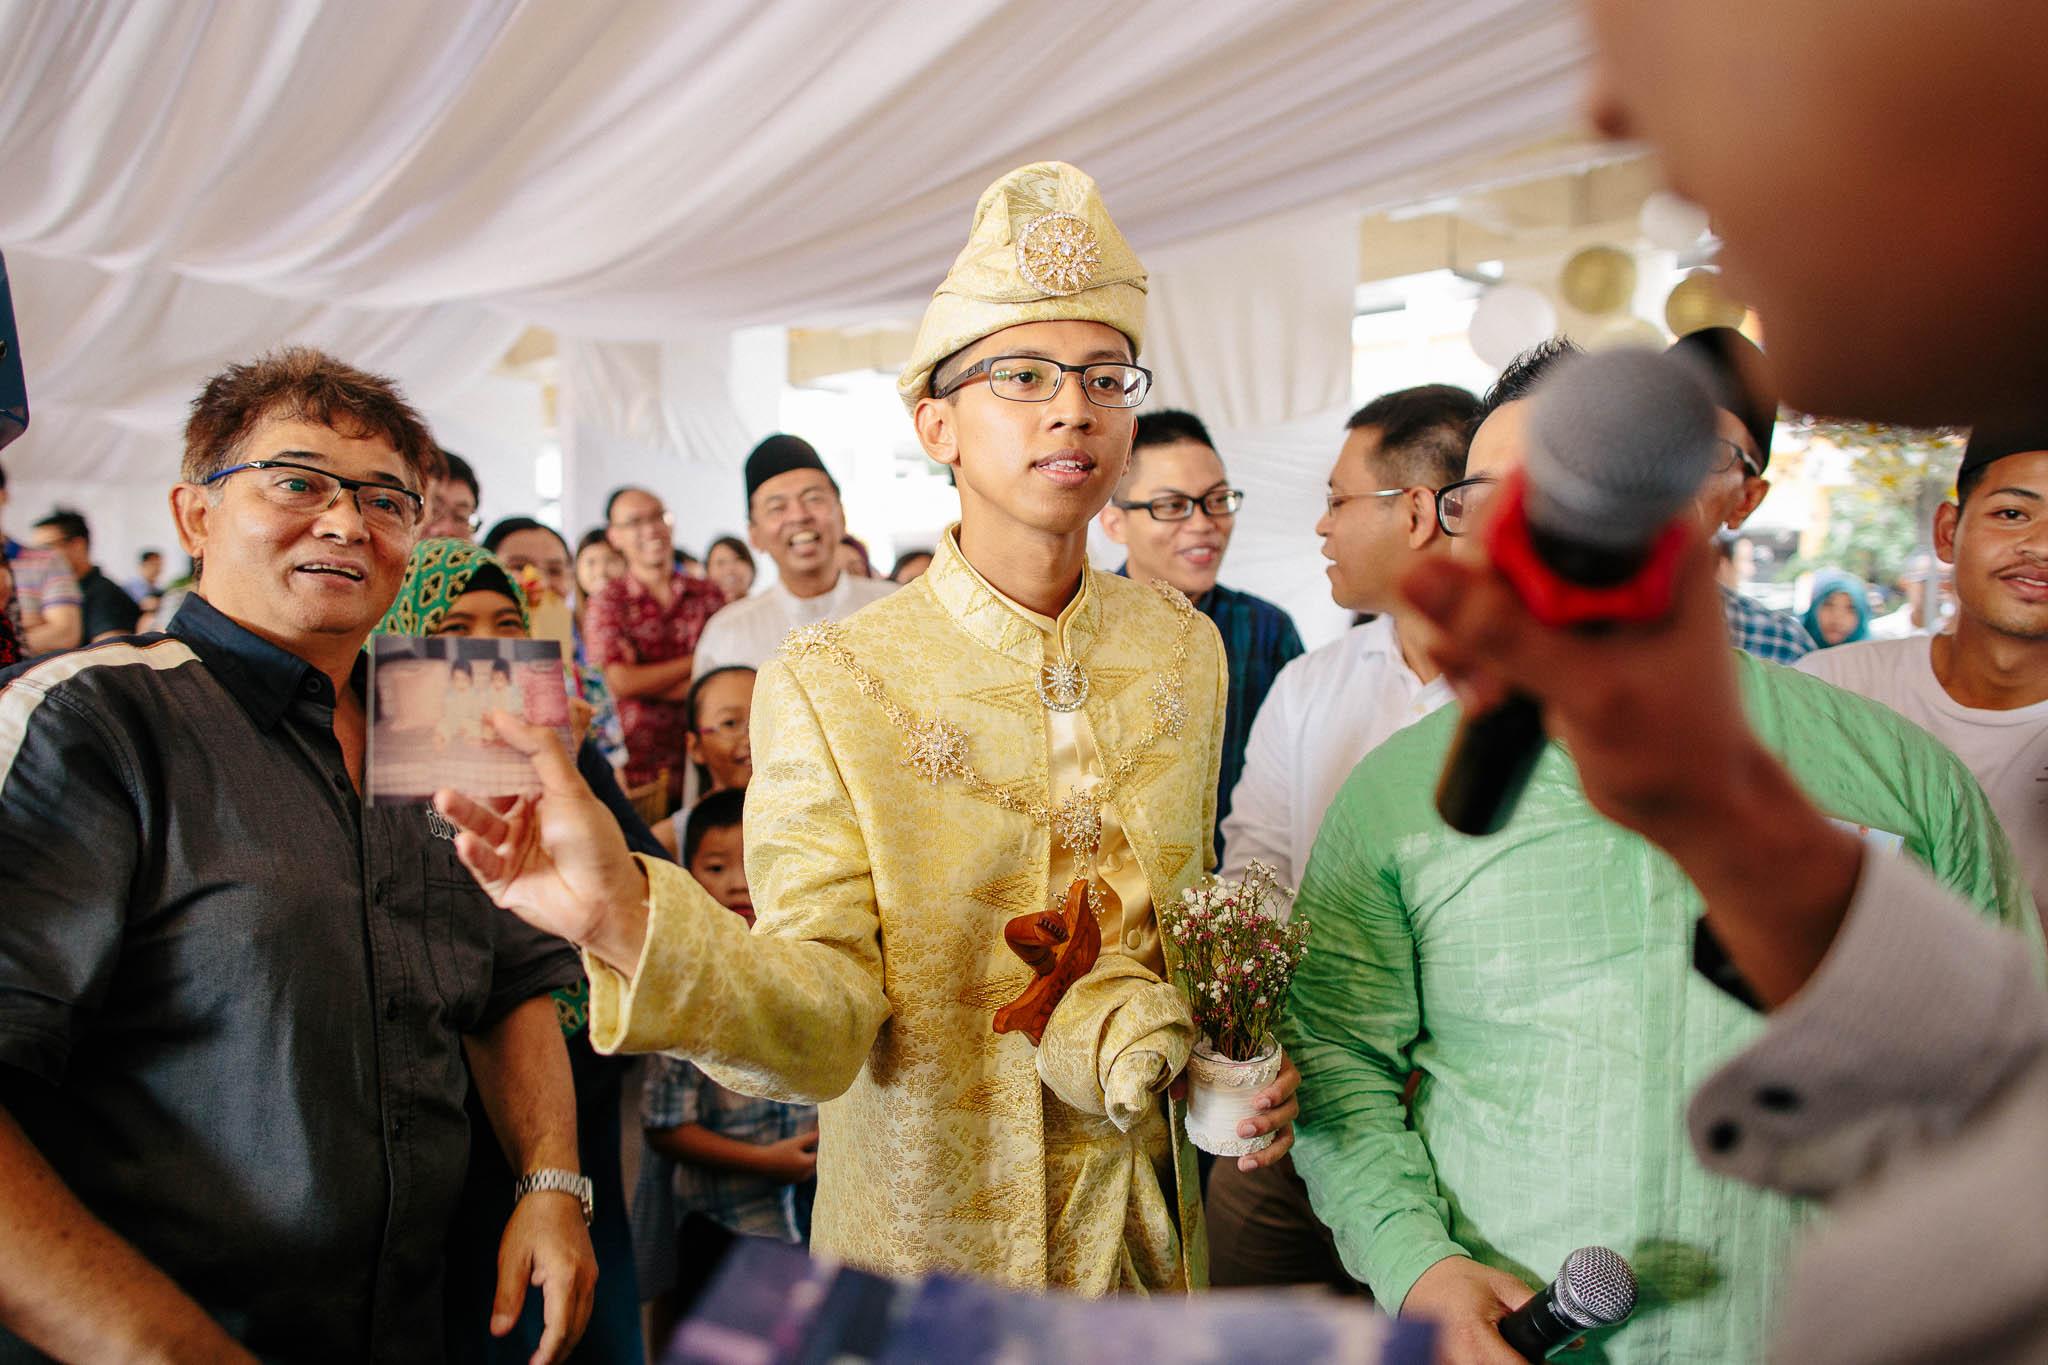 singapore-wedding-photographer-sharalyn-syazwan-031.jpg